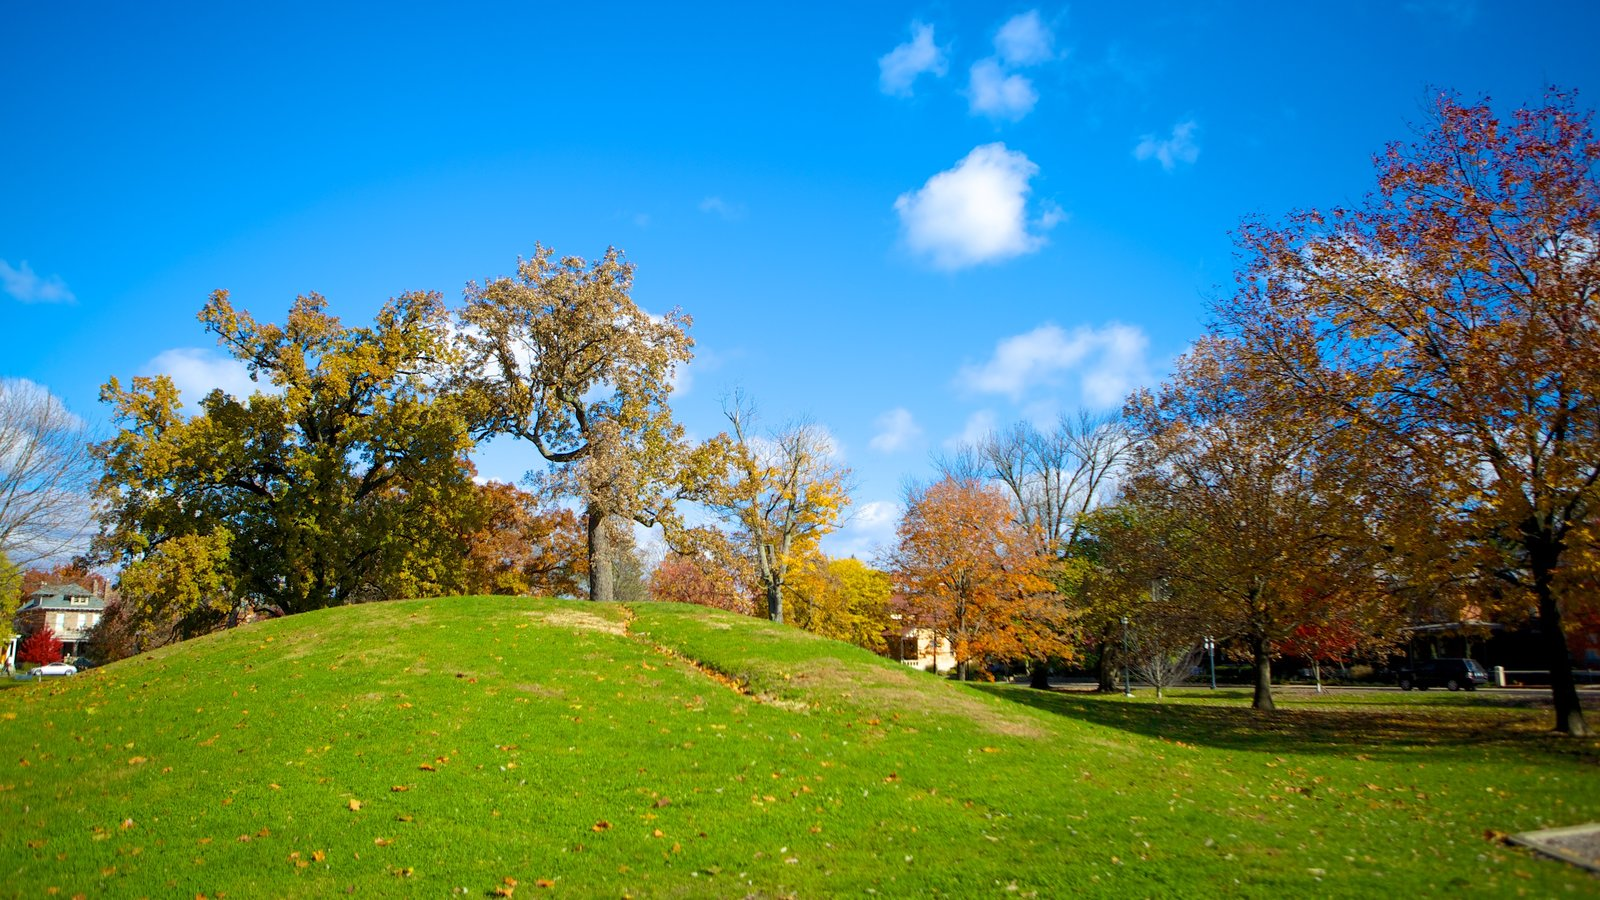 Schiller Park showing autumn leaves and a park